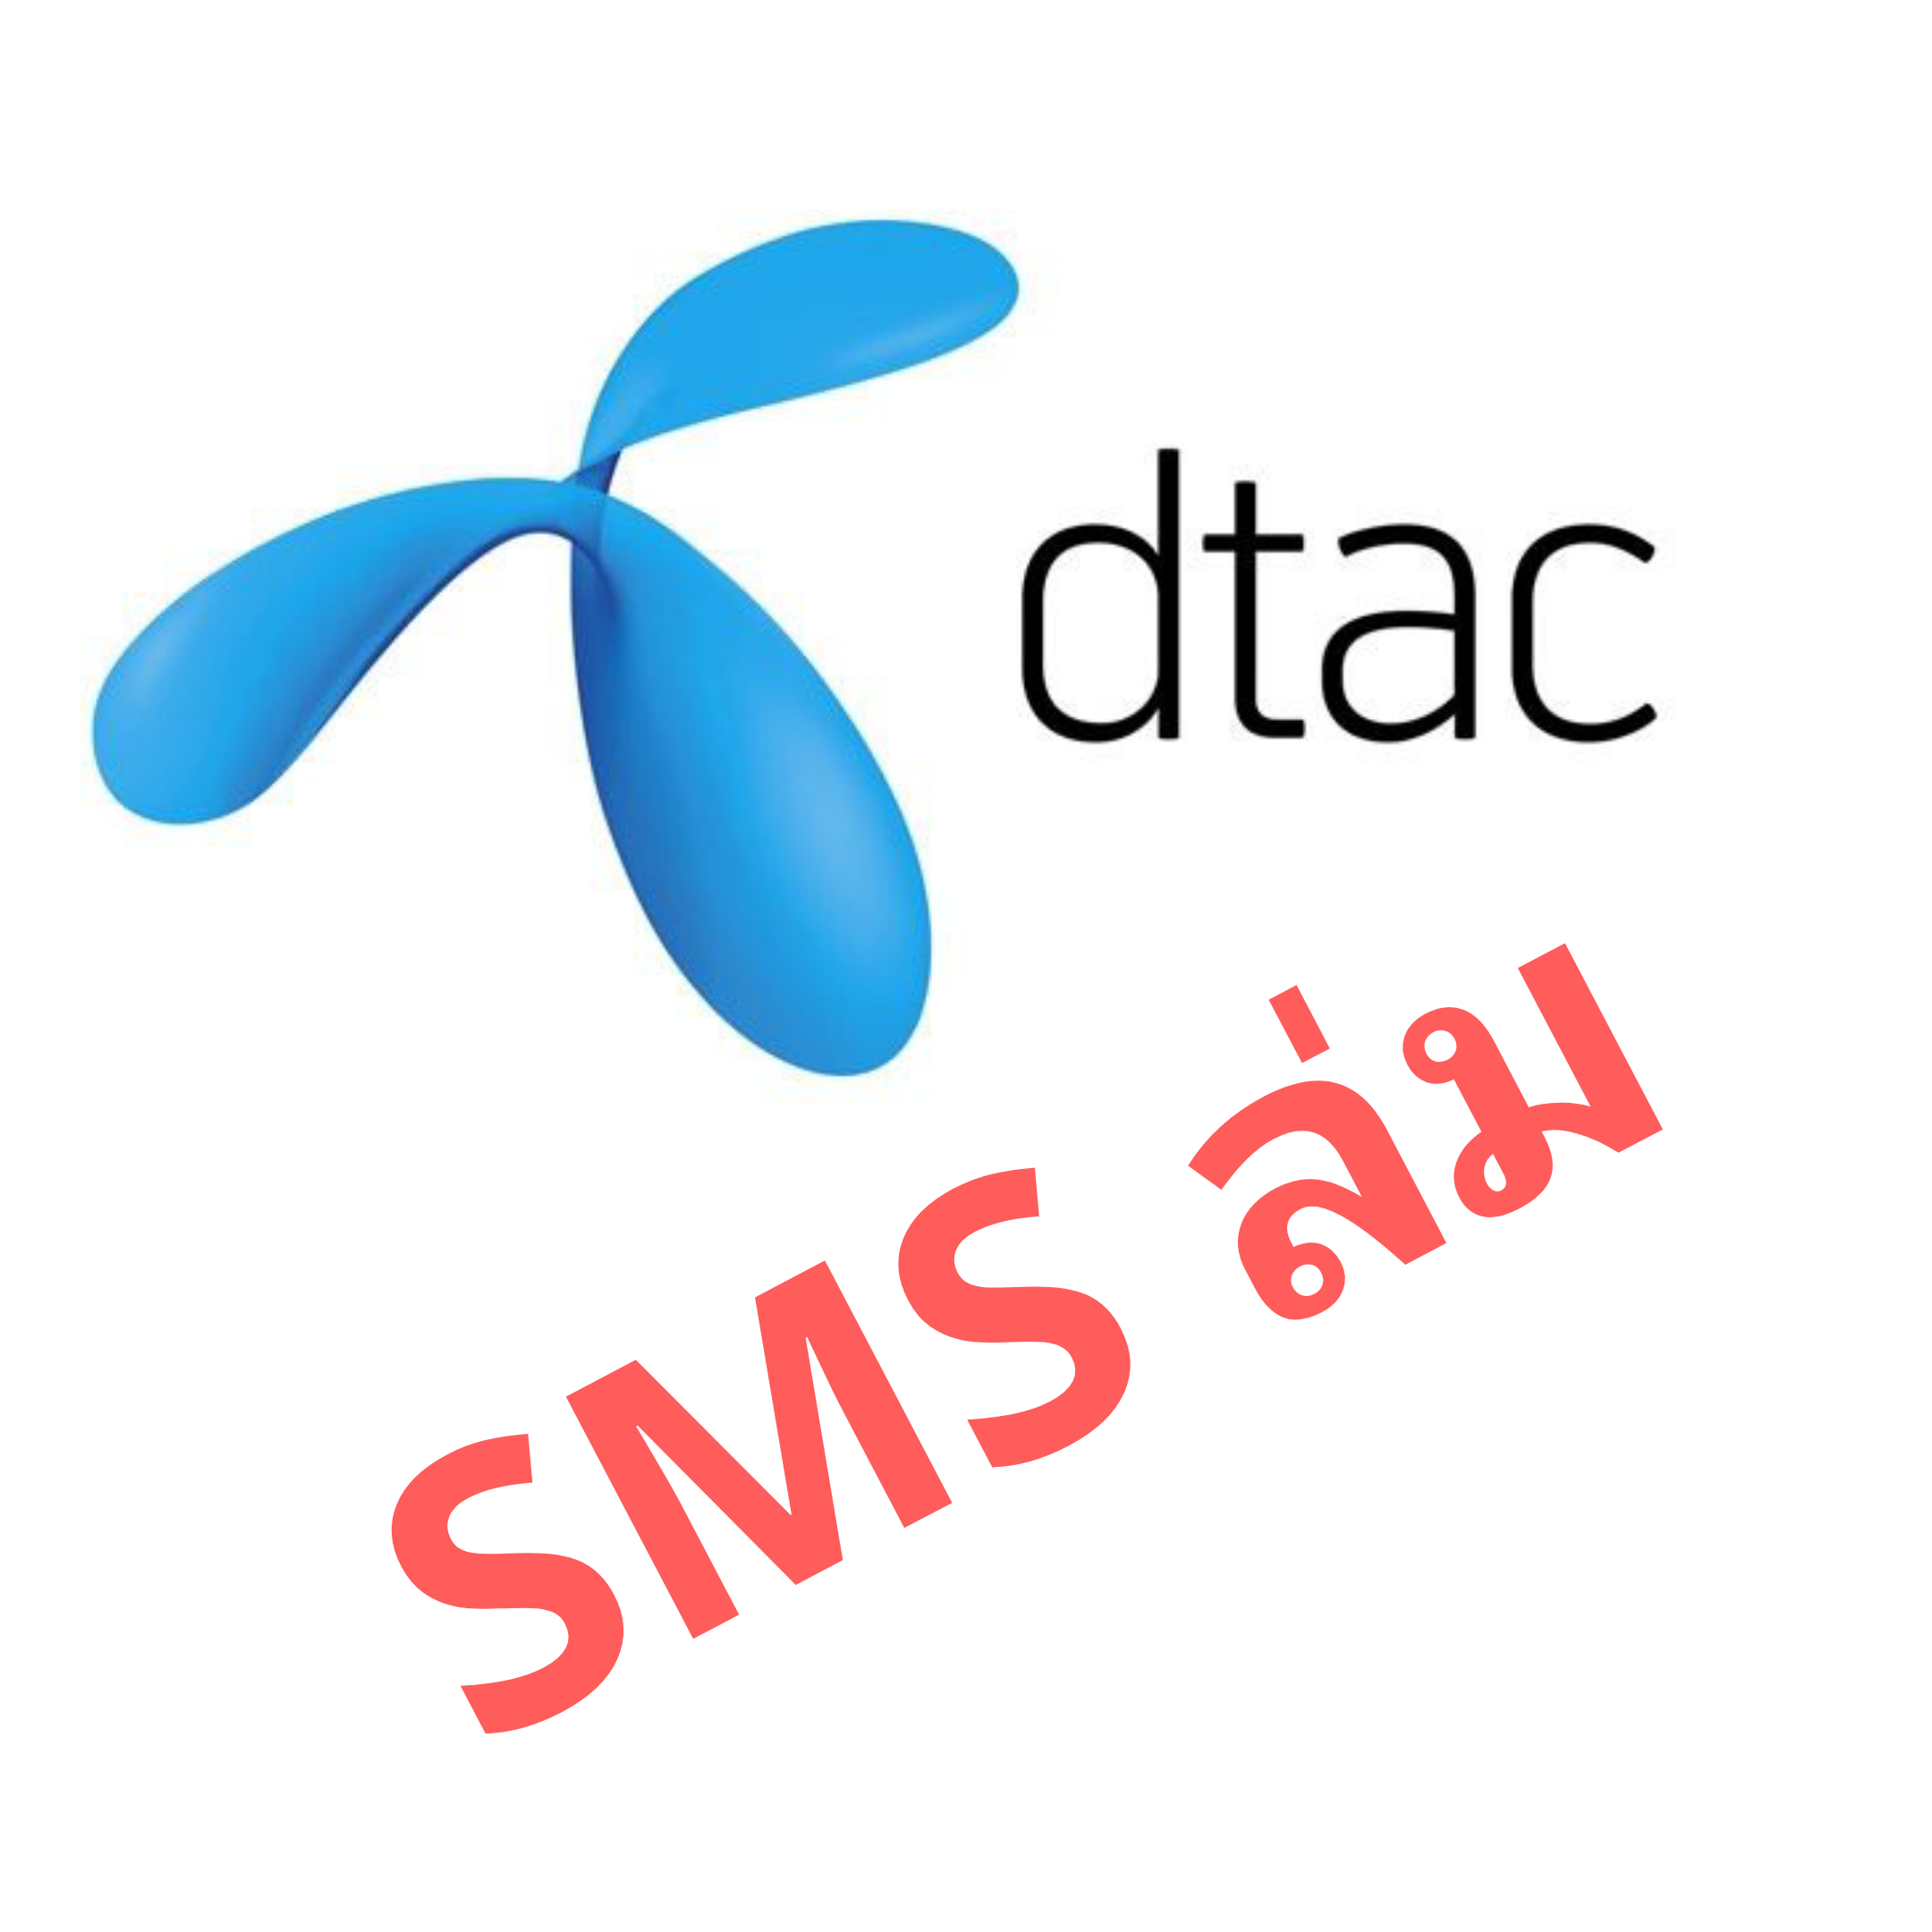 SMS Dtac ล่ม คนละครึ่งใช้ไม่ได้